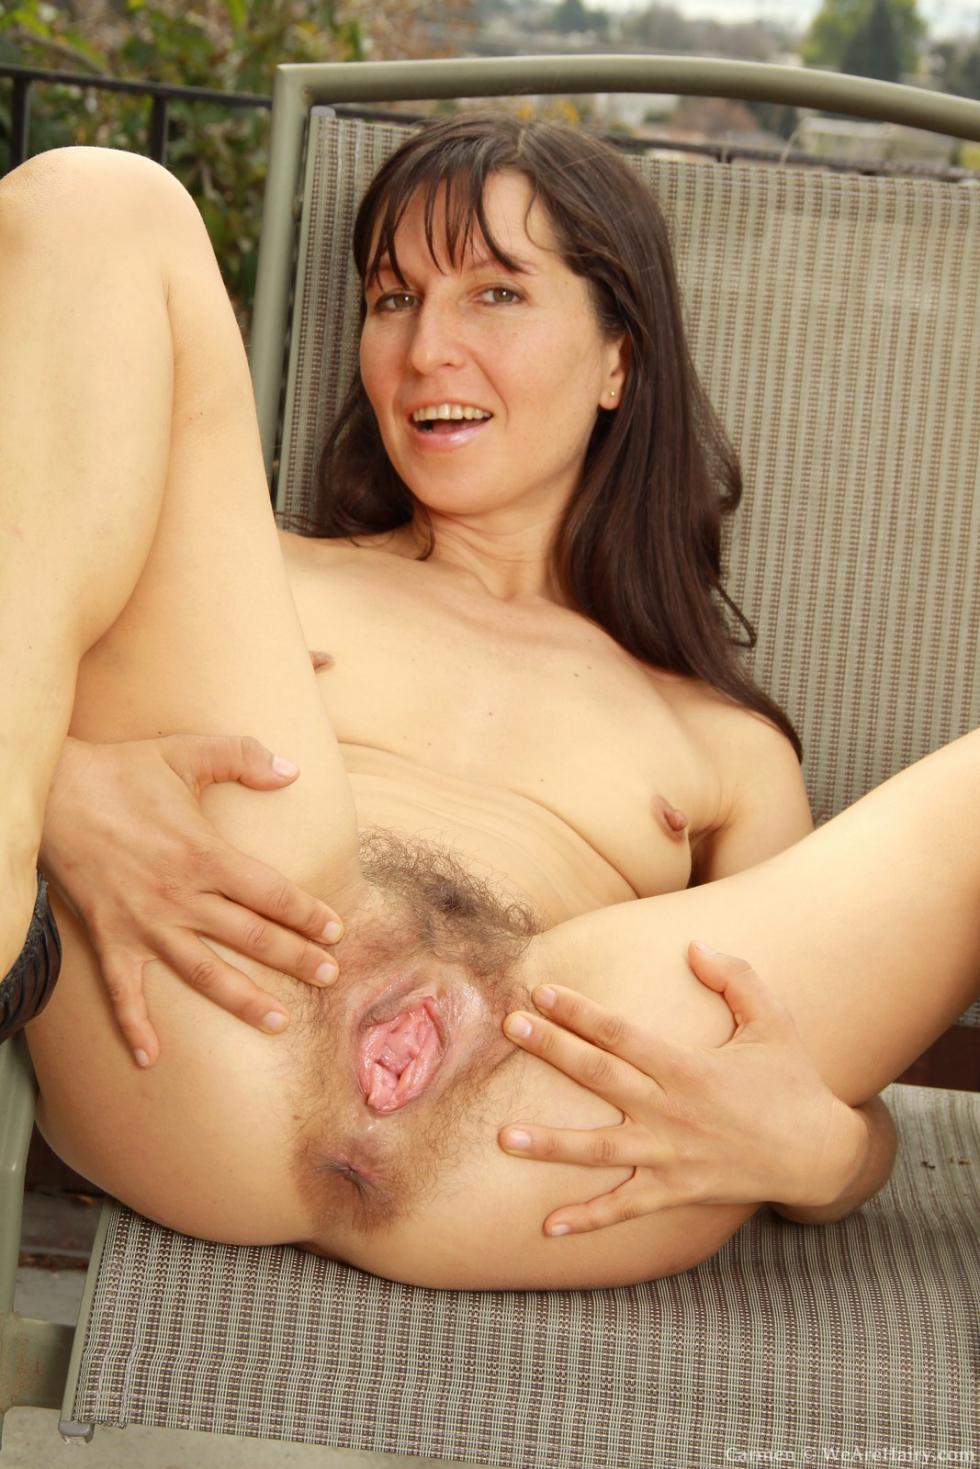 Farida gets naked in kitchen and masturbates 8